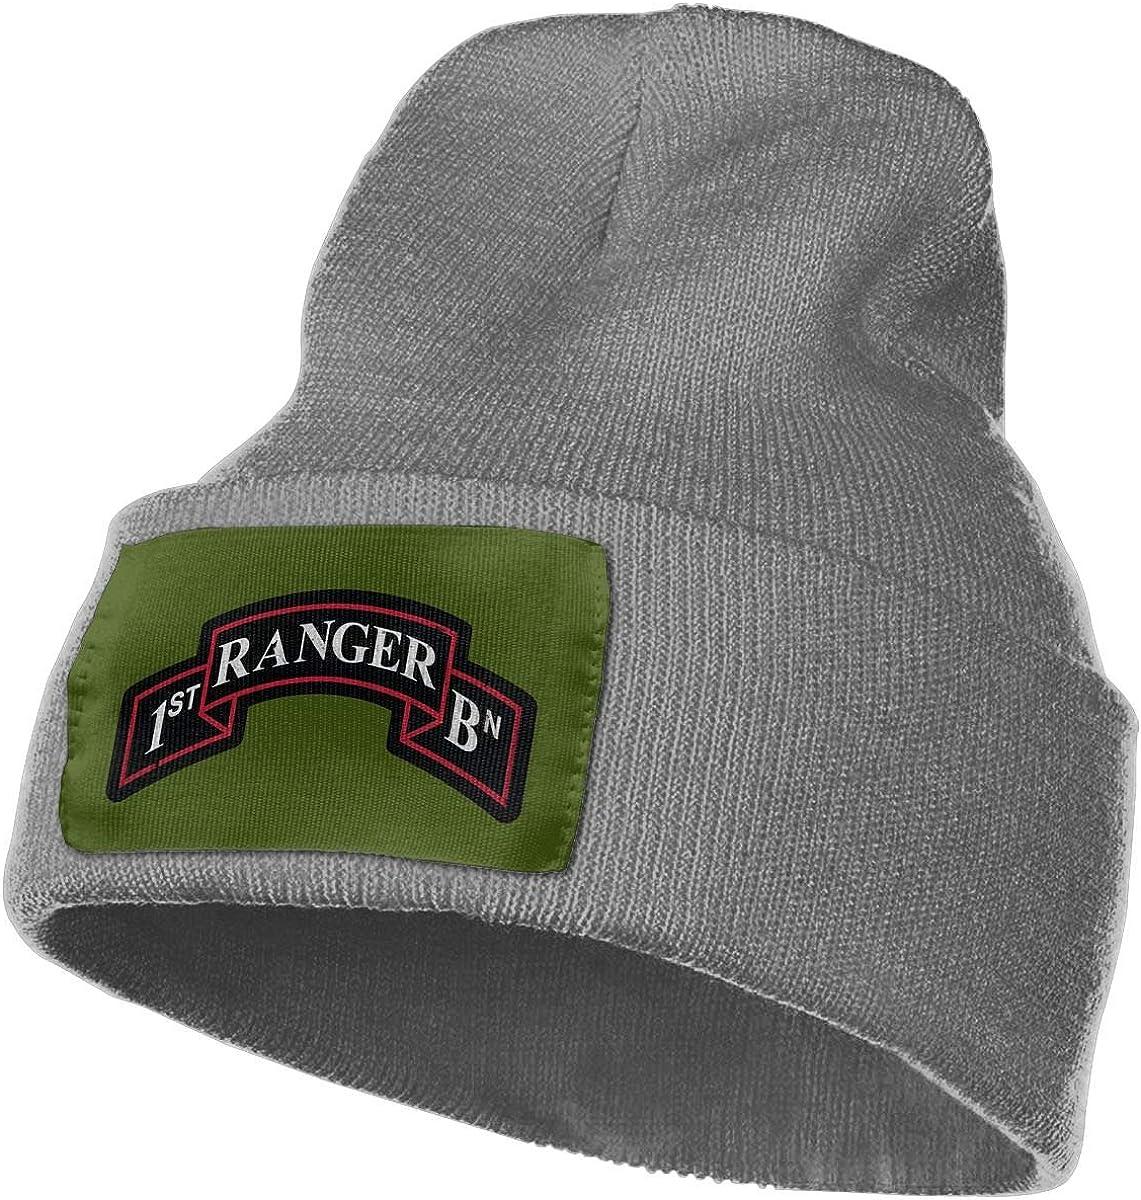 FORDSAN CP US Army Retro 1st Ranger Battalion Mens Beanie Cap Skull Cap Winter Warm Knitting Hats.